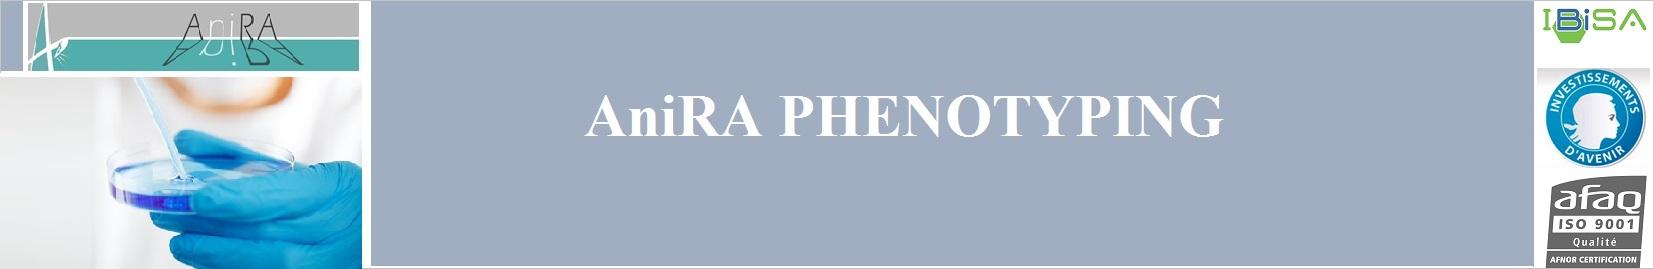 https://www.sfr-biosciences.fr/projets-labellises/Anira/phenotyping/leadImage